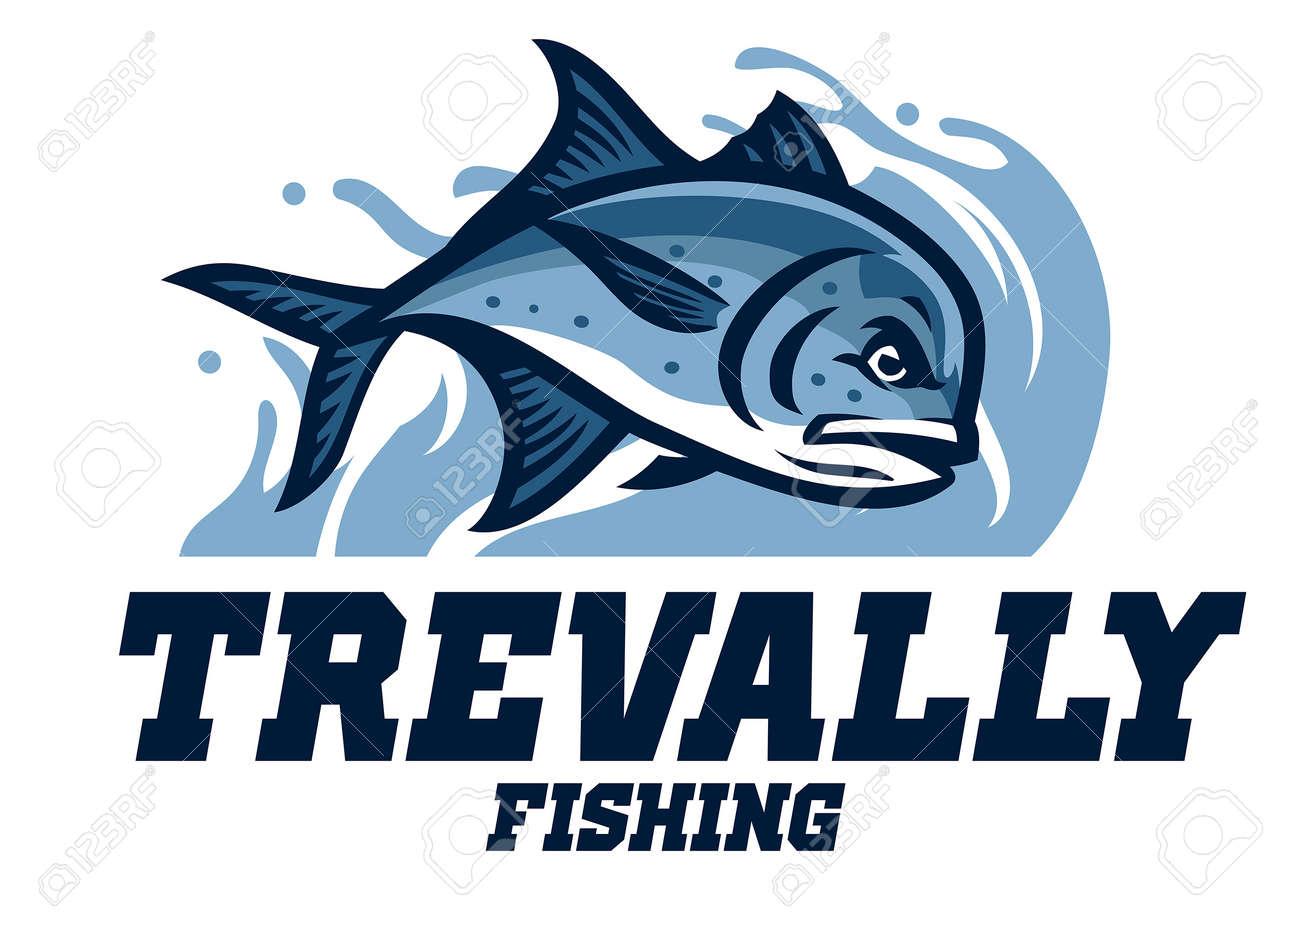 Giant trevally fishing - 169099666